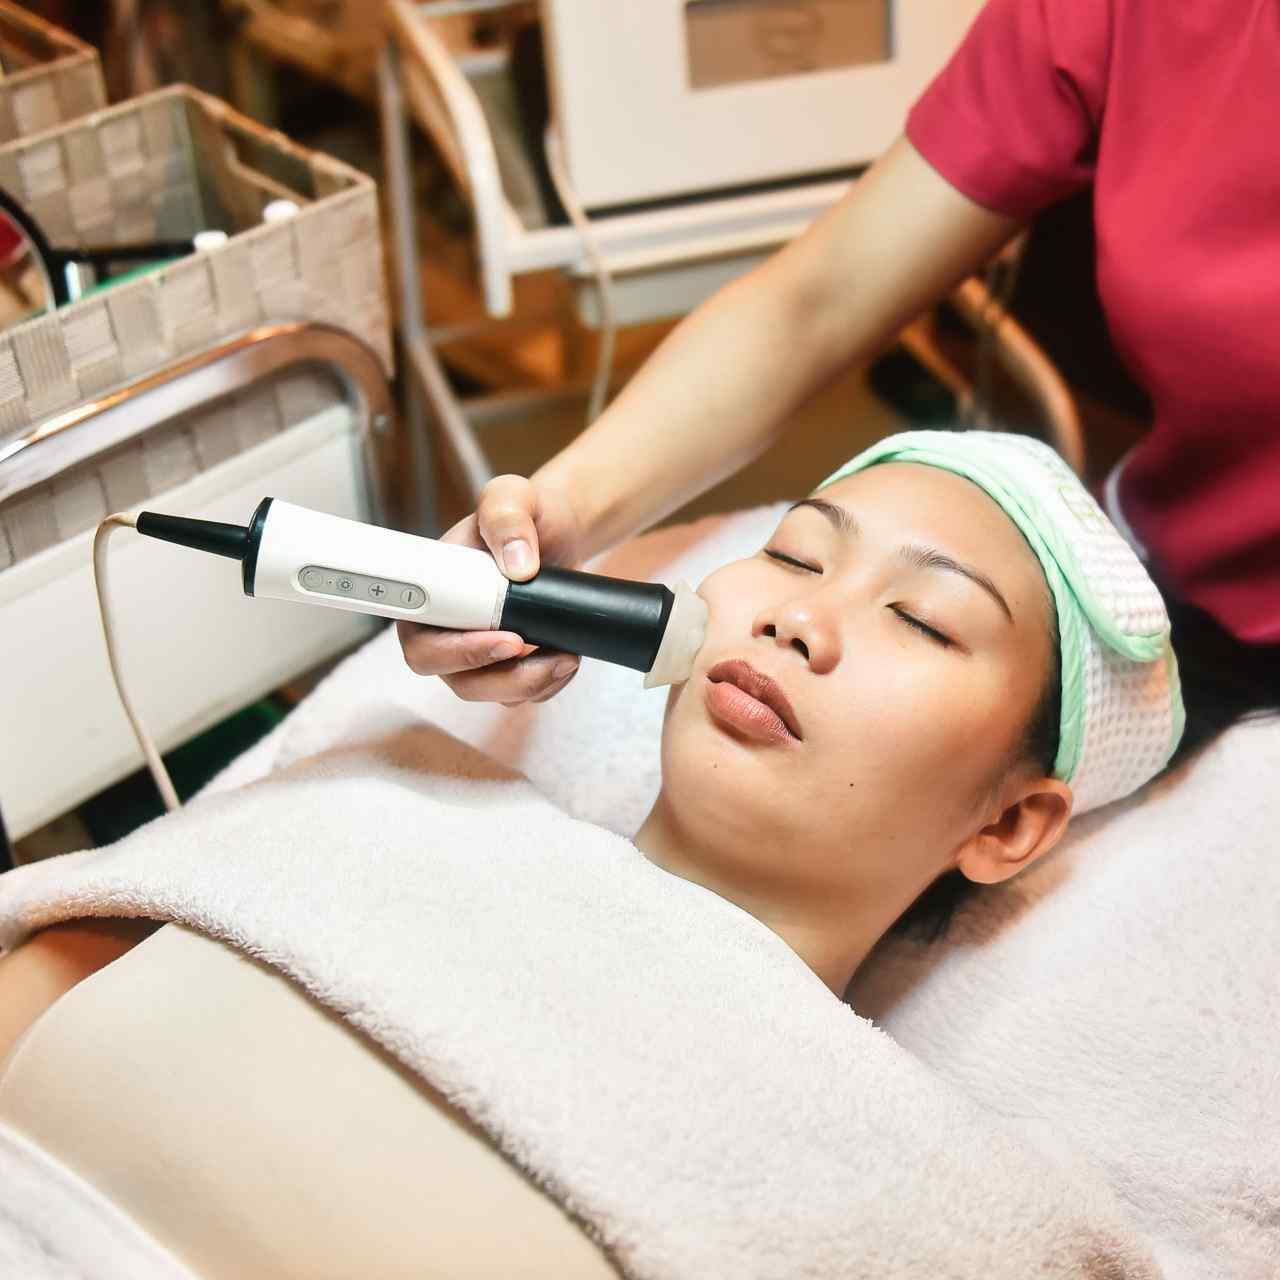 beauty, services, salon, cosmetic, laser, eyebrows, armpits, whitening, facial, thinning, metro manila, quezon city, salons in quezon city